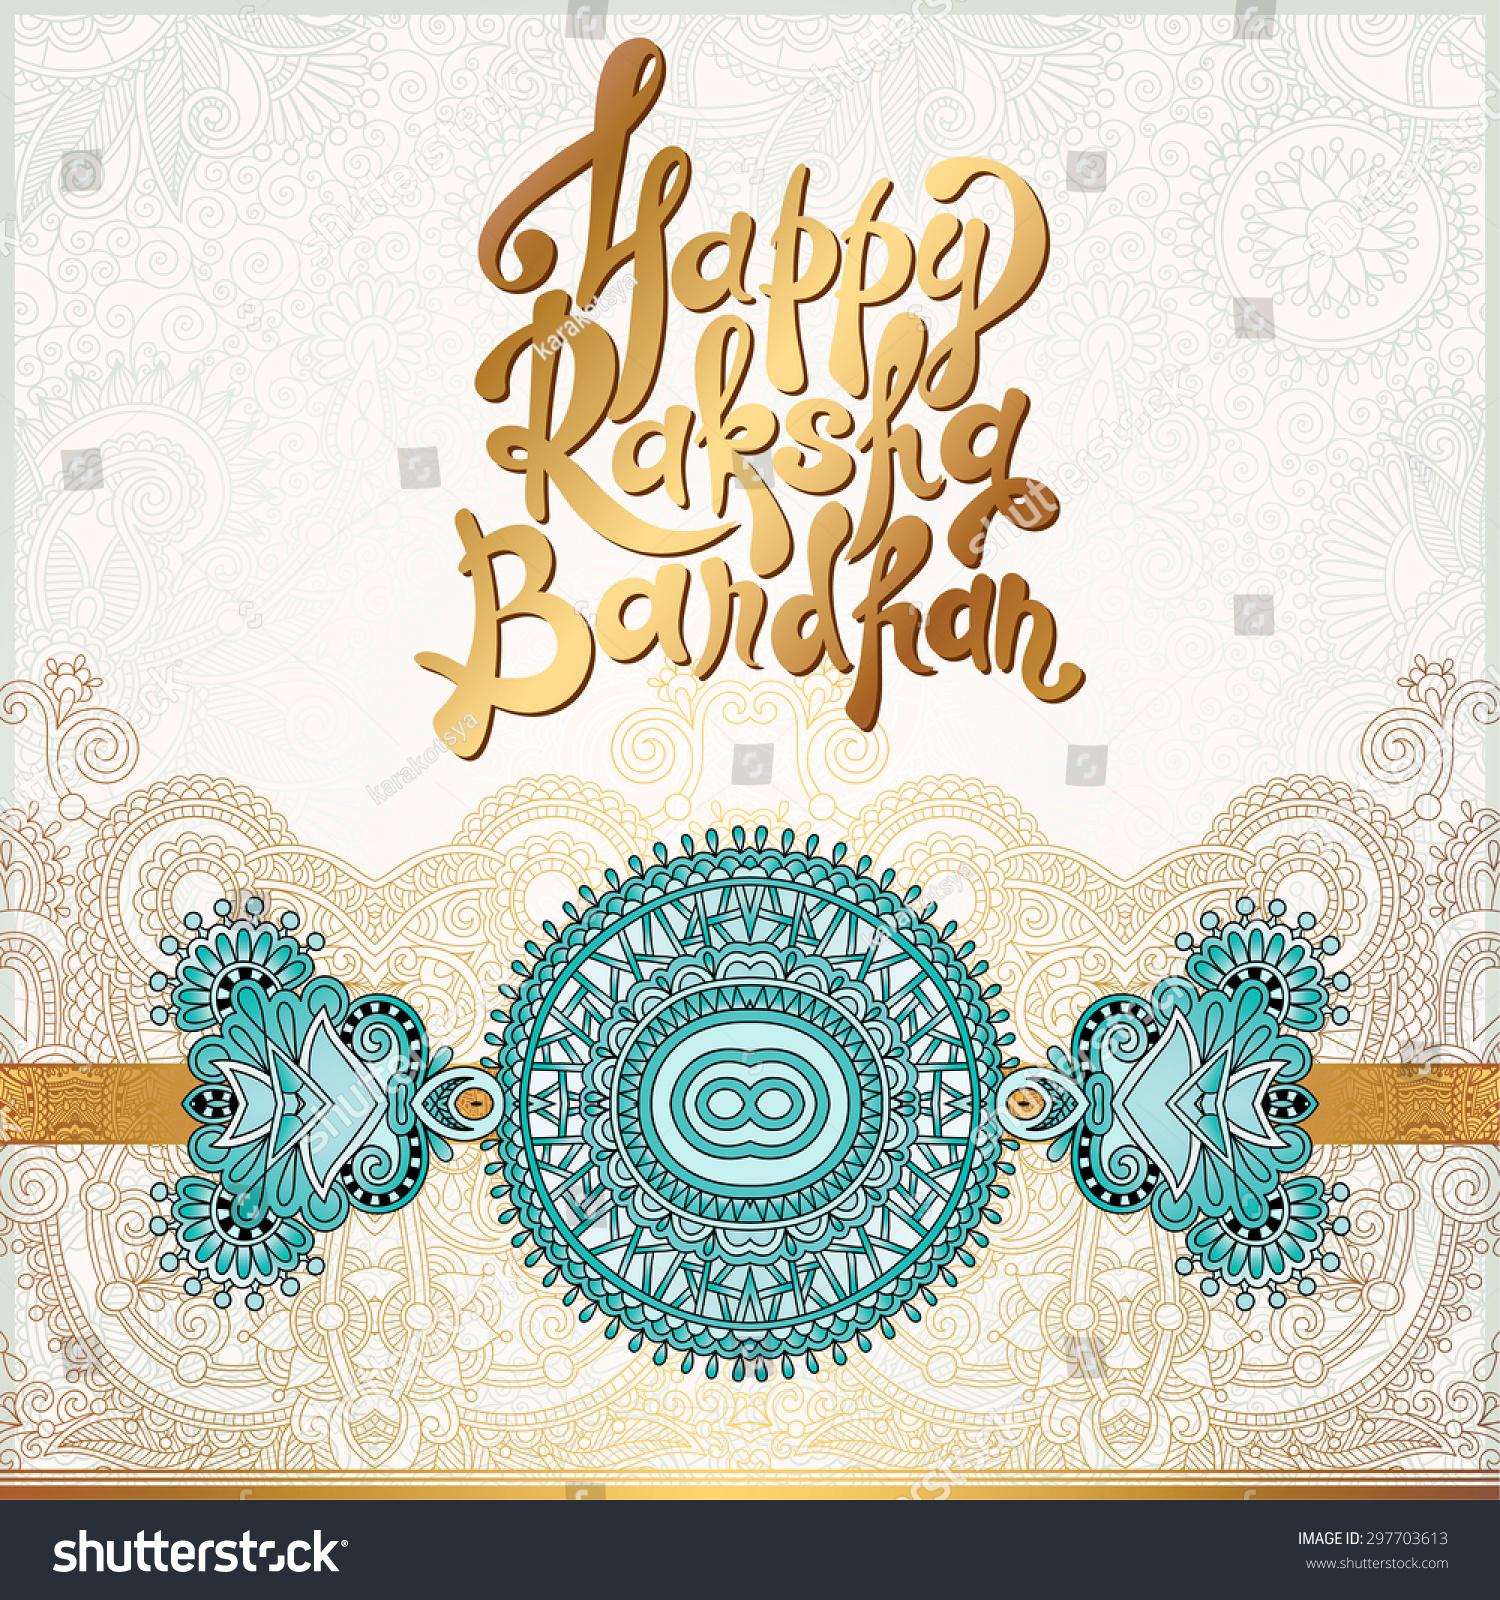 Happy rakhi greeting card indian holiday stock vector 297703613 happy rakhi greeting card for indian holiday raksha bandhan with original ornamental bangle on floral light kristyandbryce Choice Image